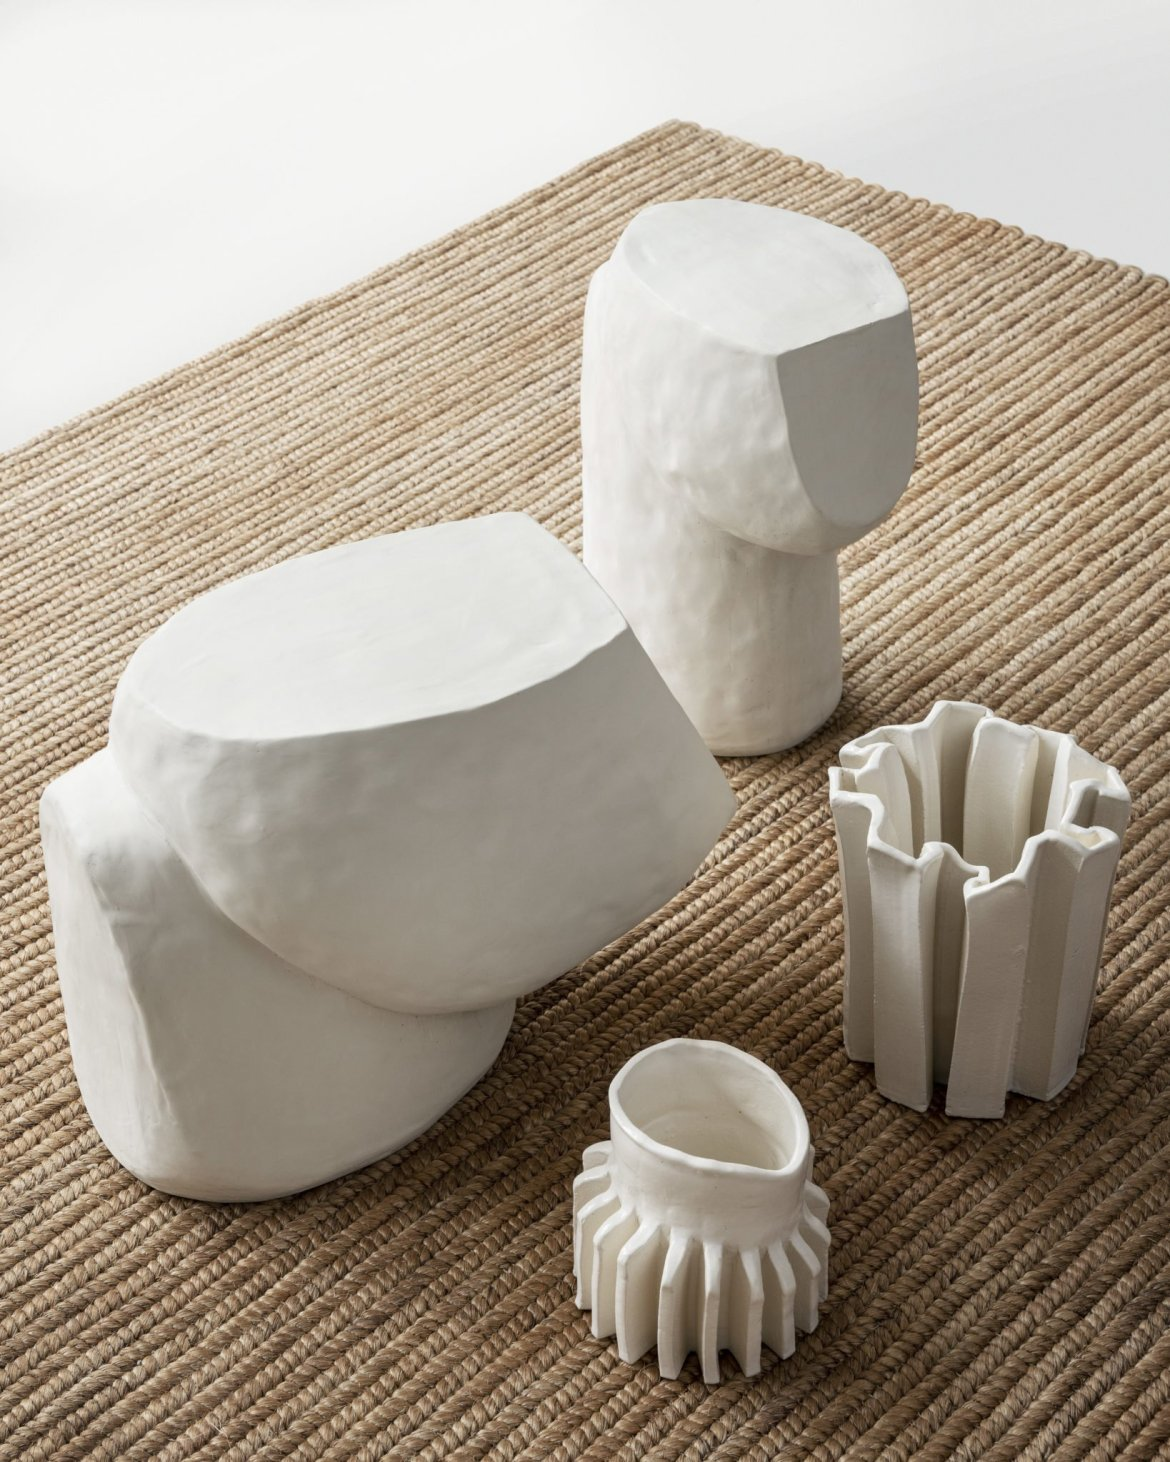 Mobilier et objets design, Frédéric Imbert pour Jessica Barouch (galerie JAG)